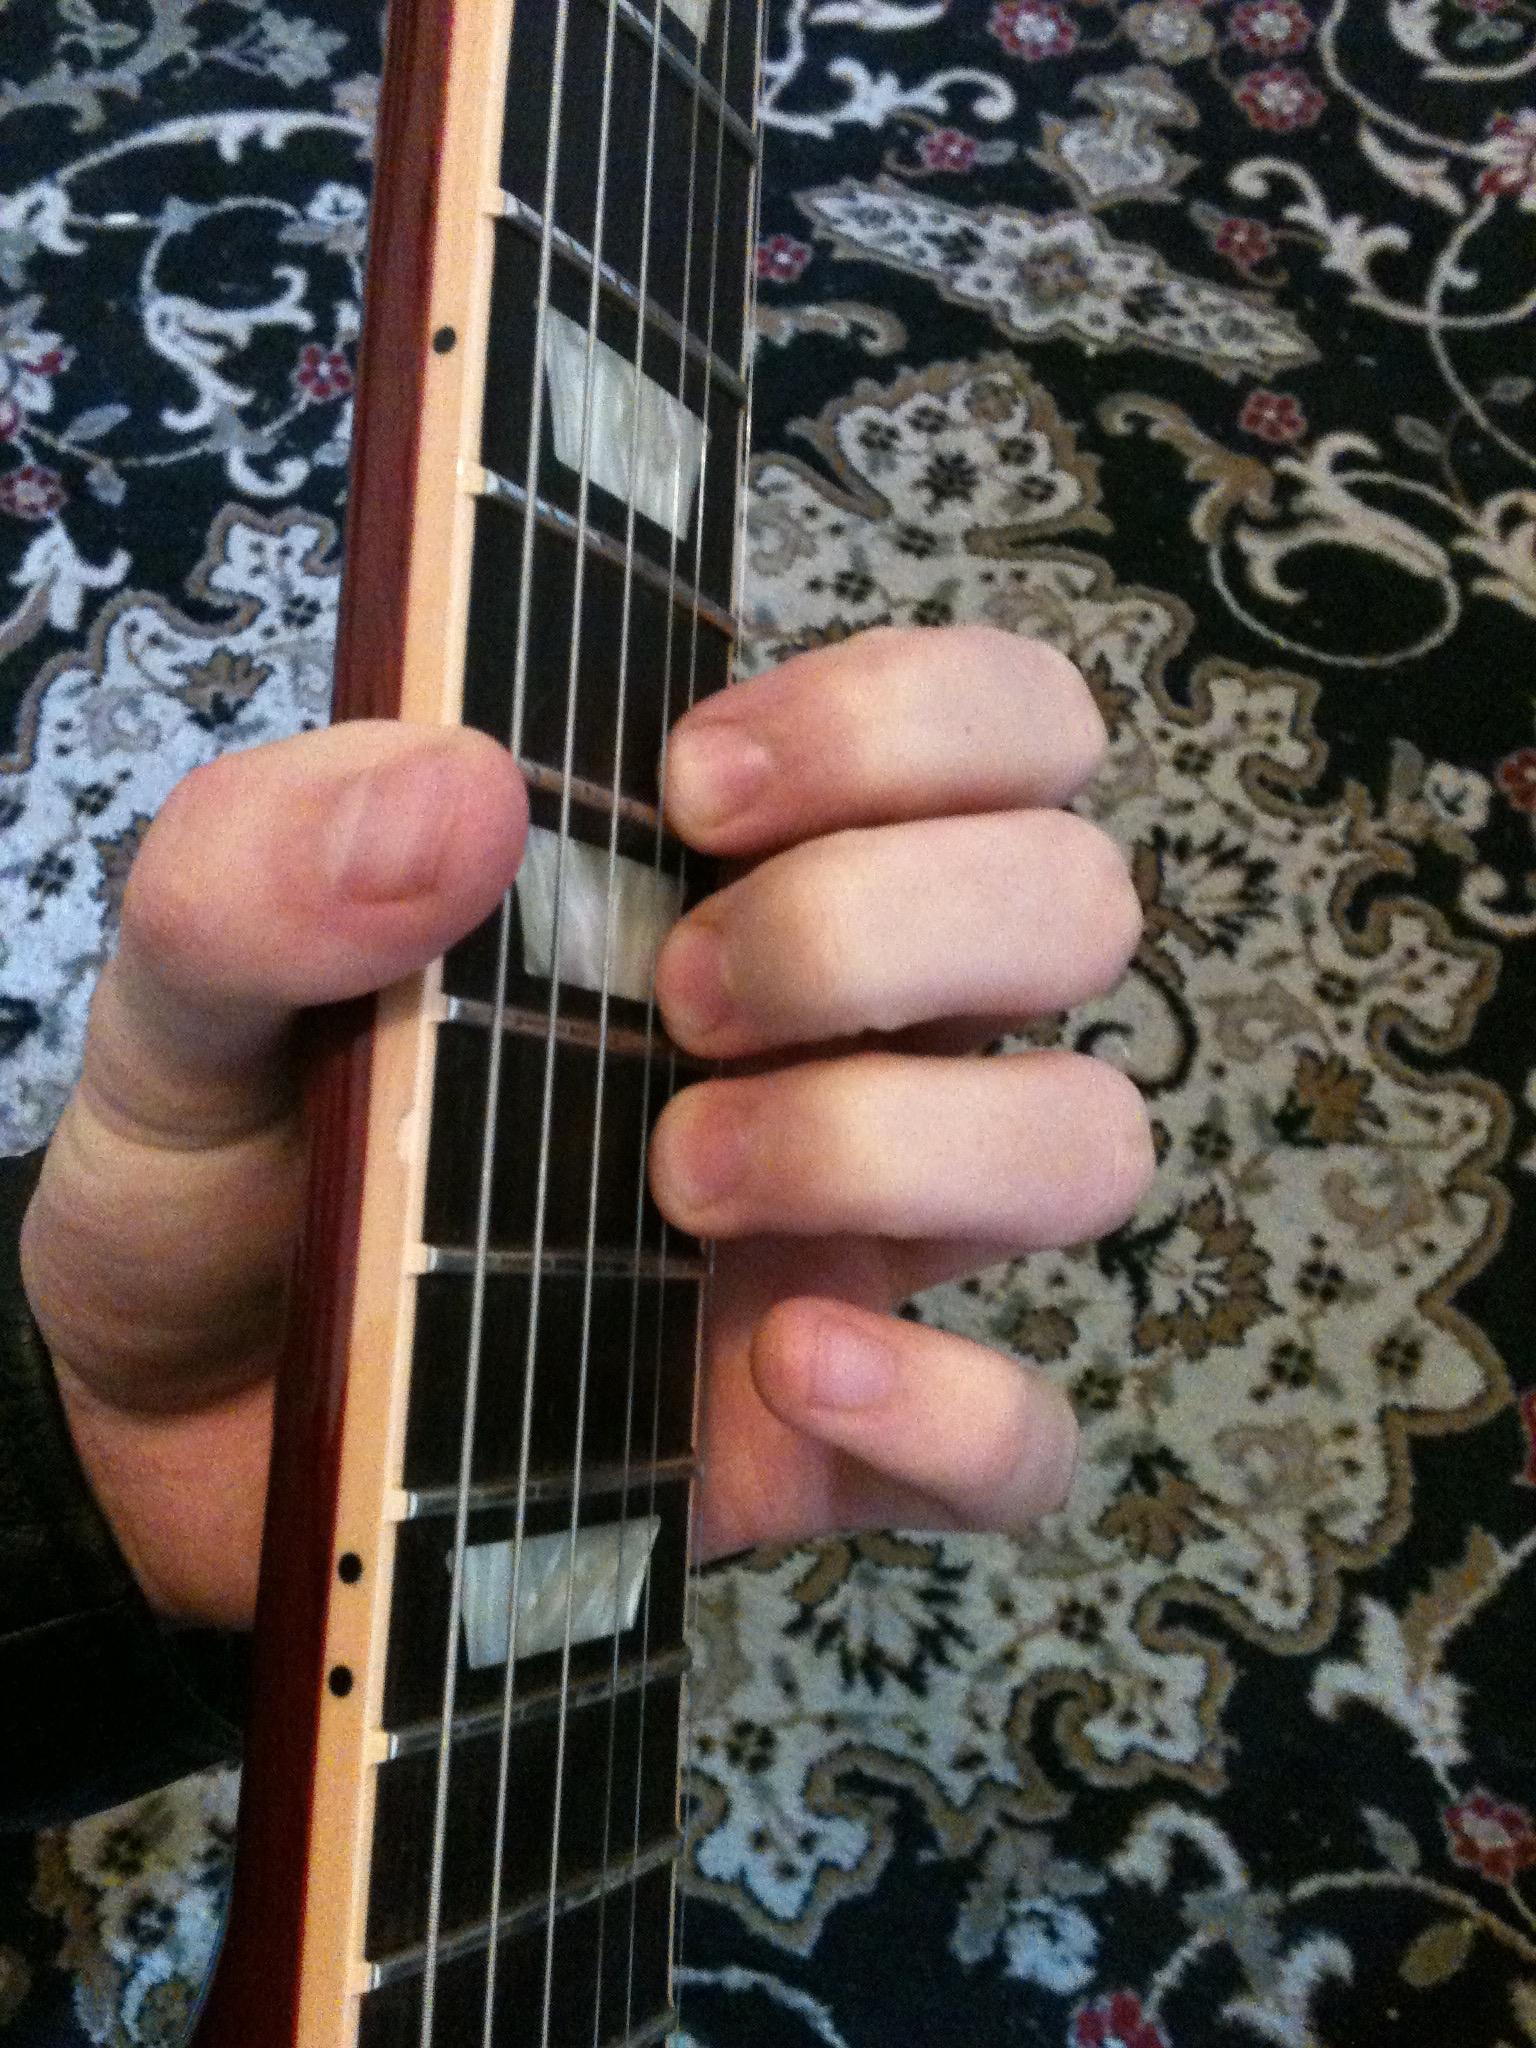 Holding The Neck For Vibrato